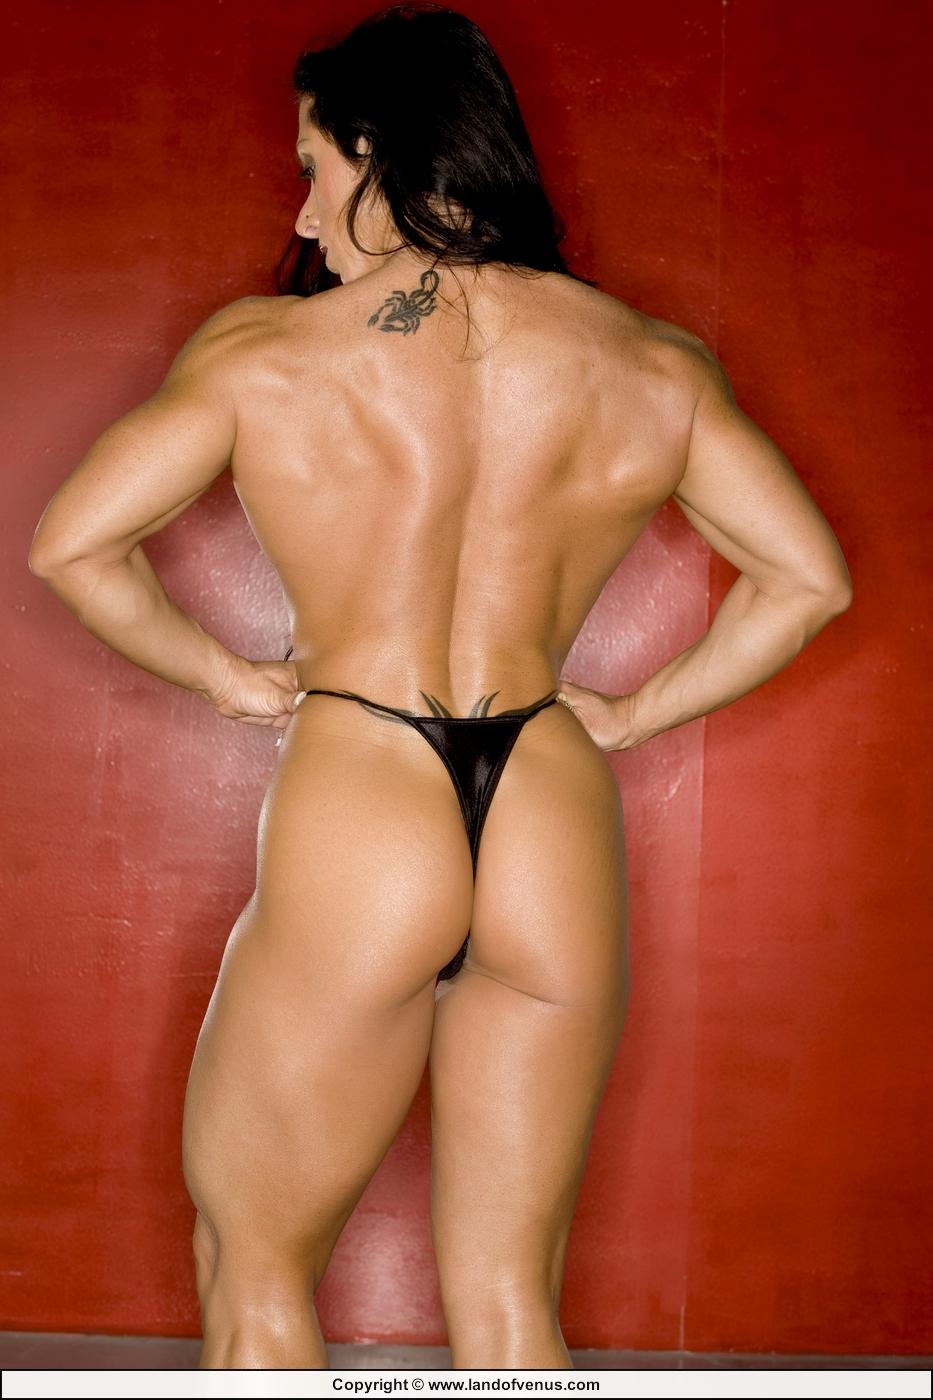 IFBB Pro Bodybuilder Monica Martin Nude